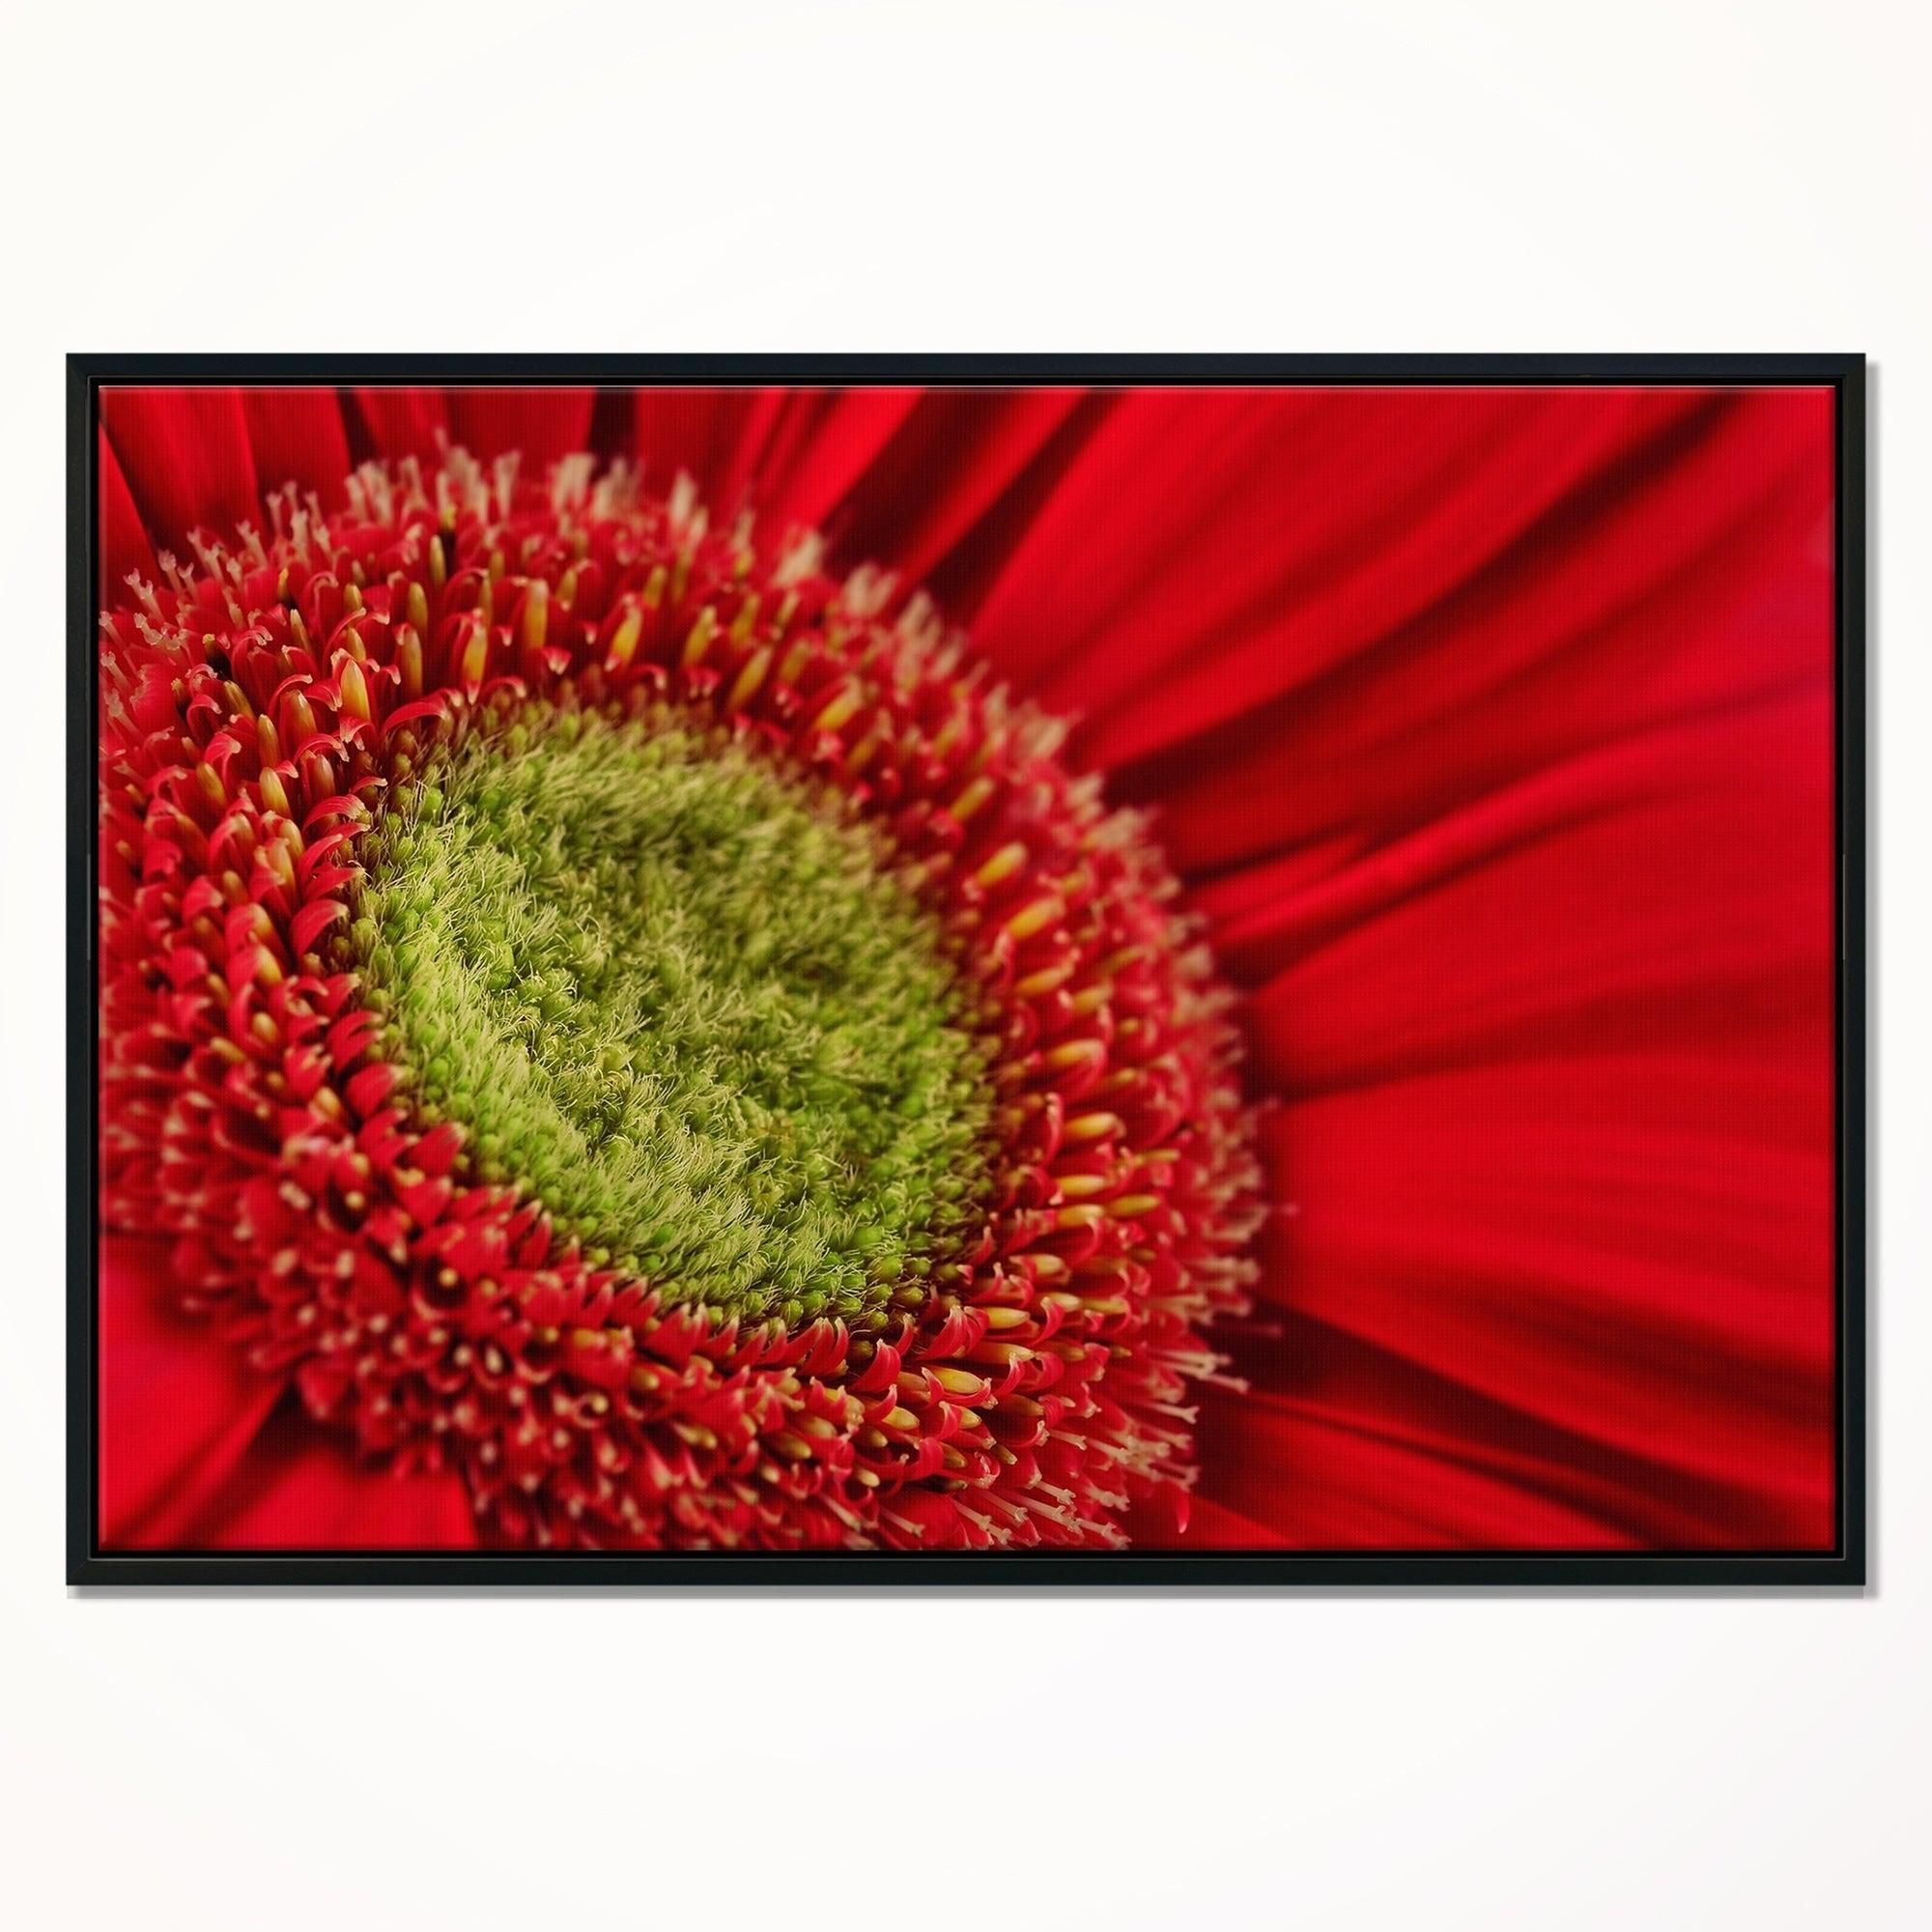 Designart red daisy gerbera flower close up flowers framed canvas designart red daisy gerbera flower close up flowers framed canvas wall artwork free shipping today overstock 25010485 izmirmasajfo